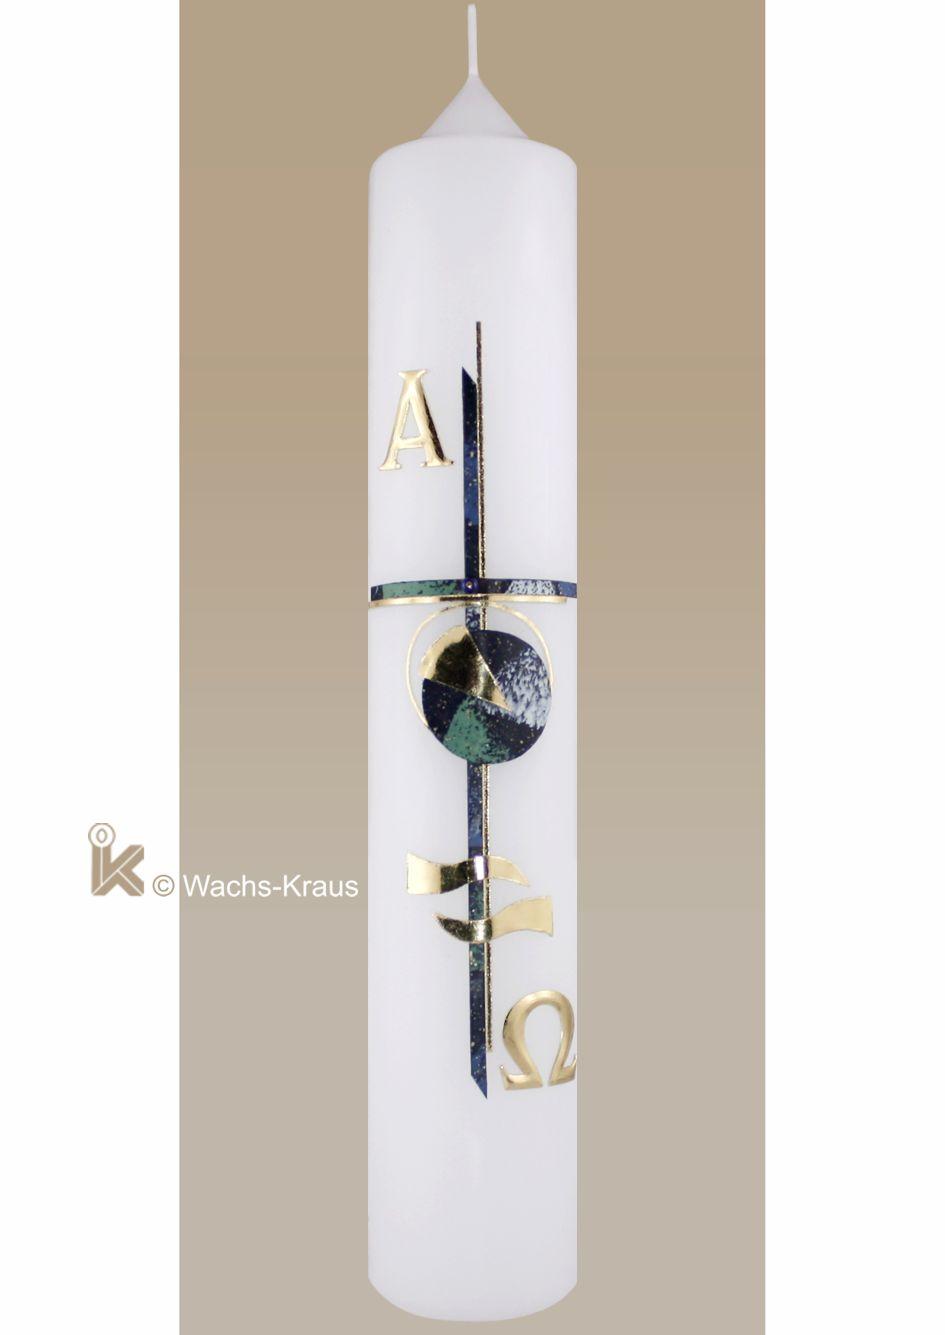 Moderne Taufkerze Junge, grün-blau-gold, Kreuz, Alpha und Omega, Welle